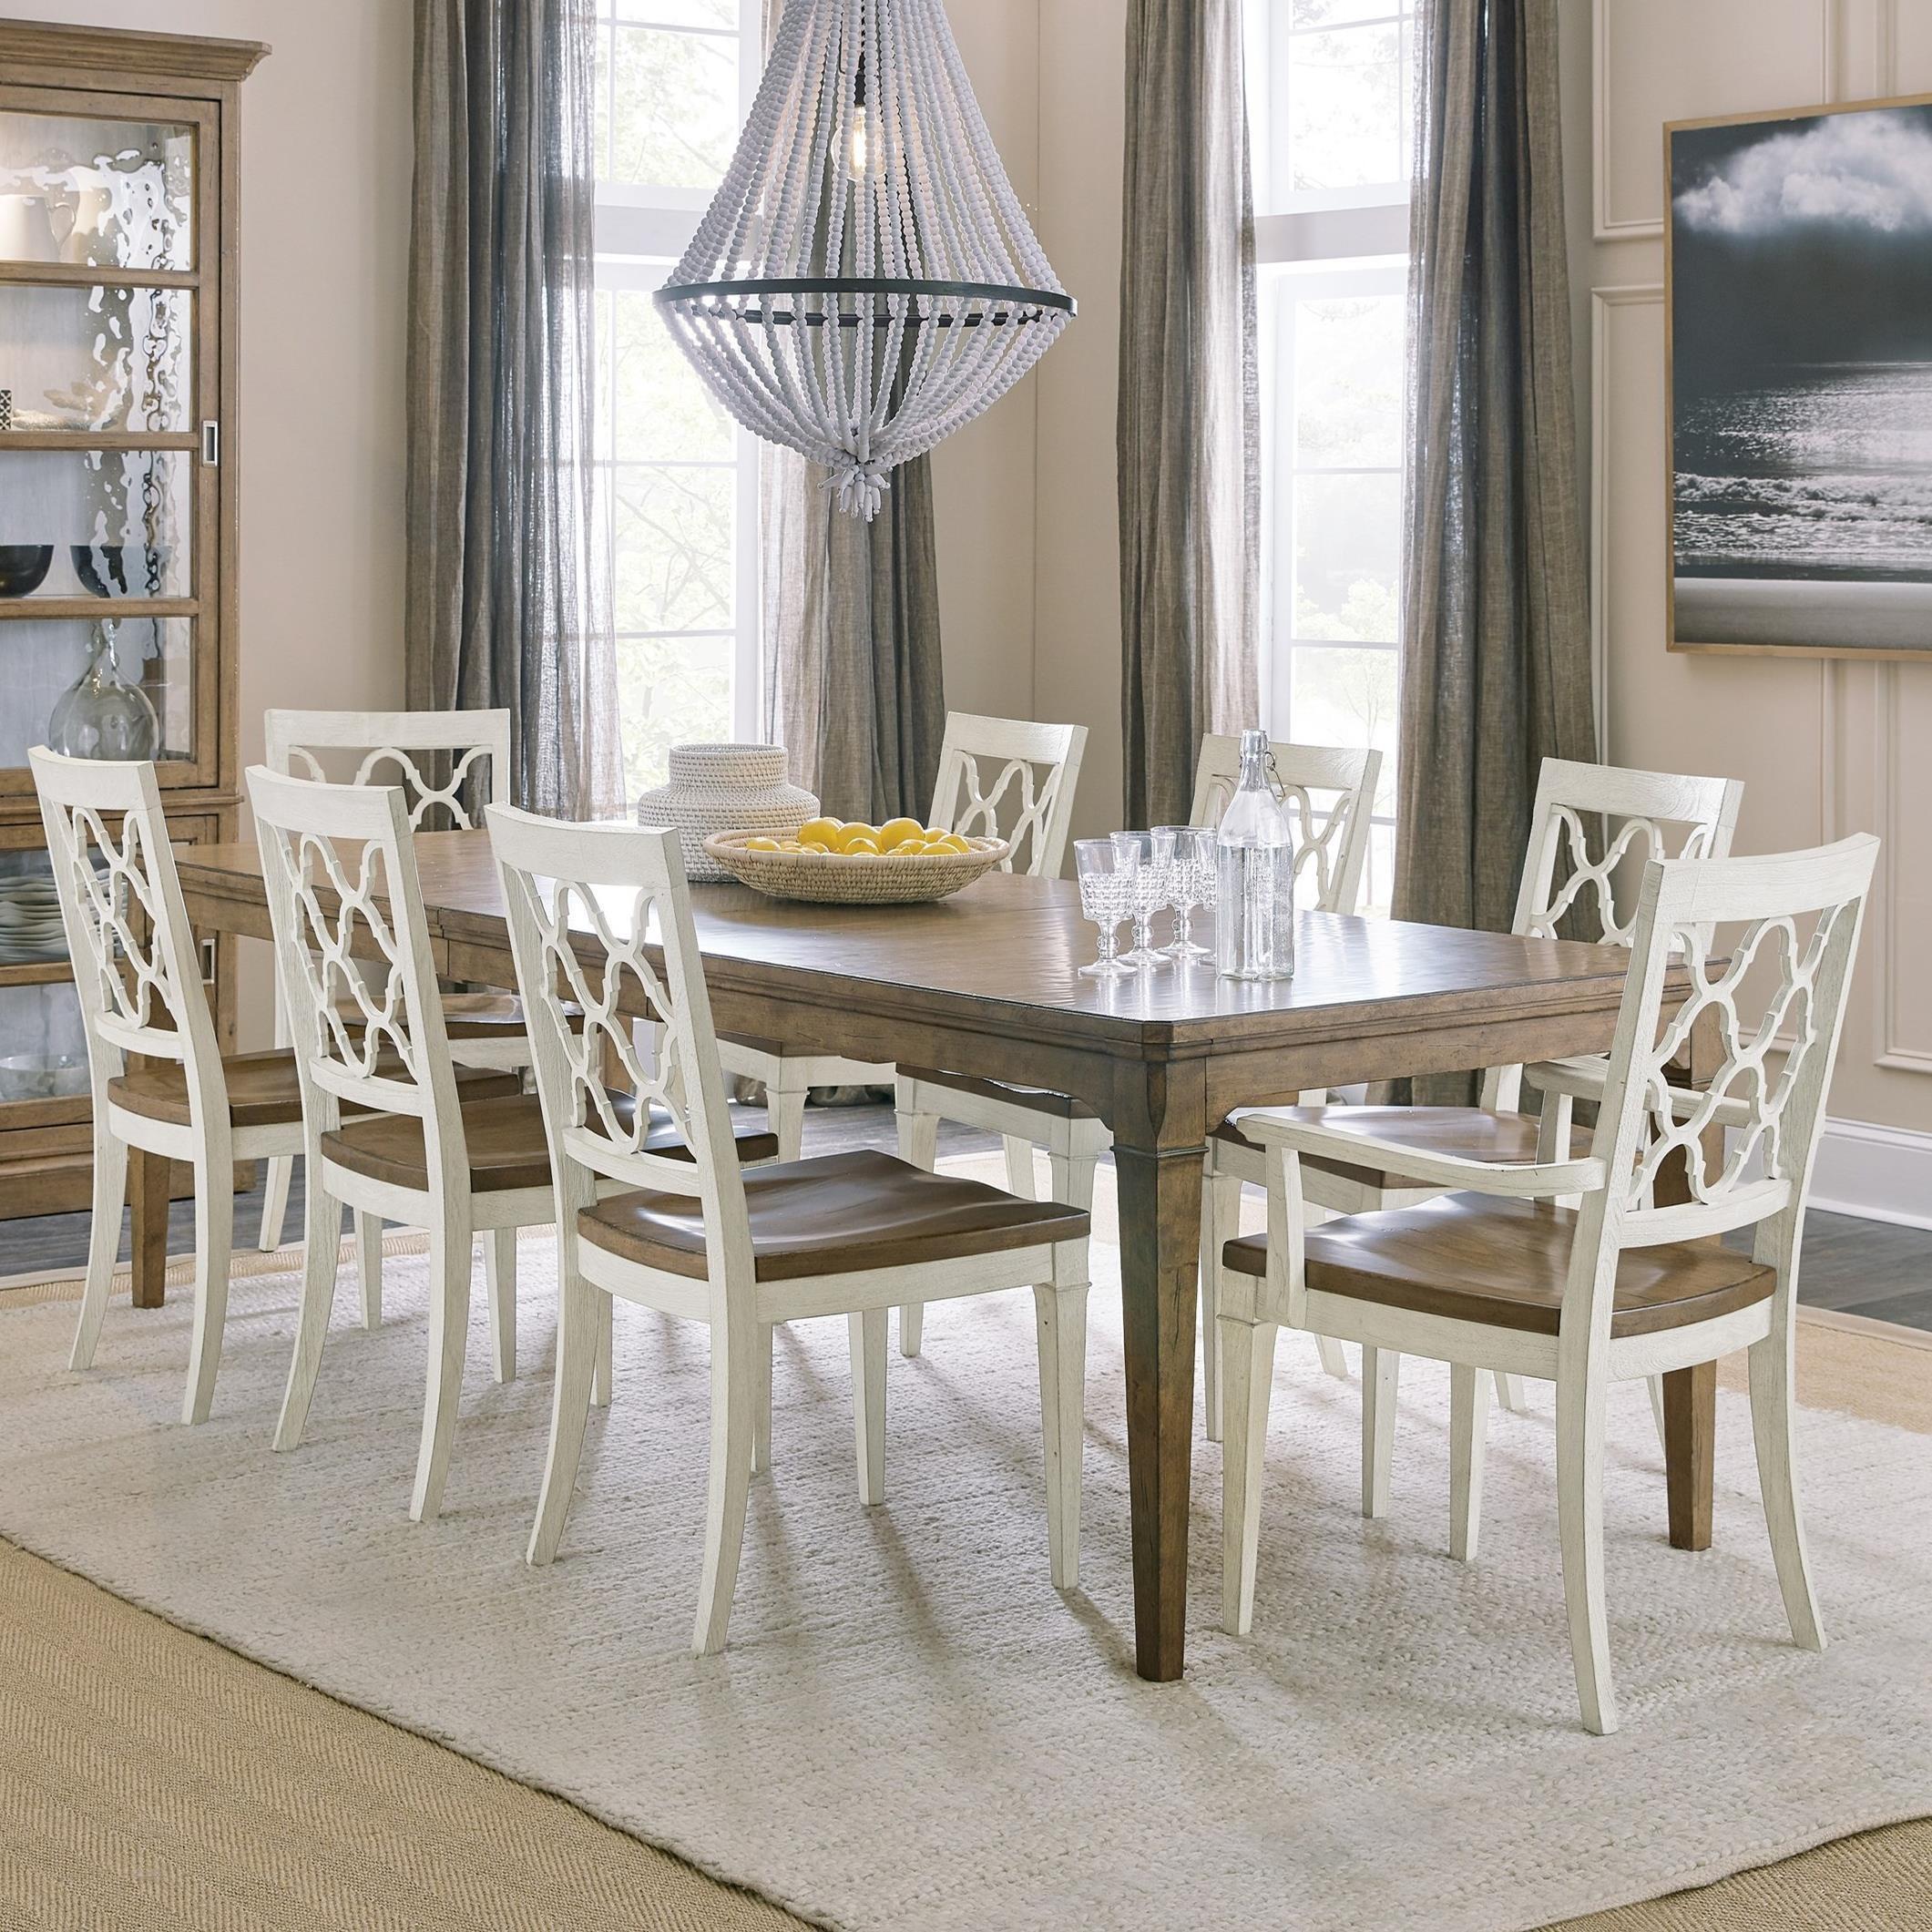 Montebello 9-Piece Dining Set by Hooker Furniture at Mueller Furniture